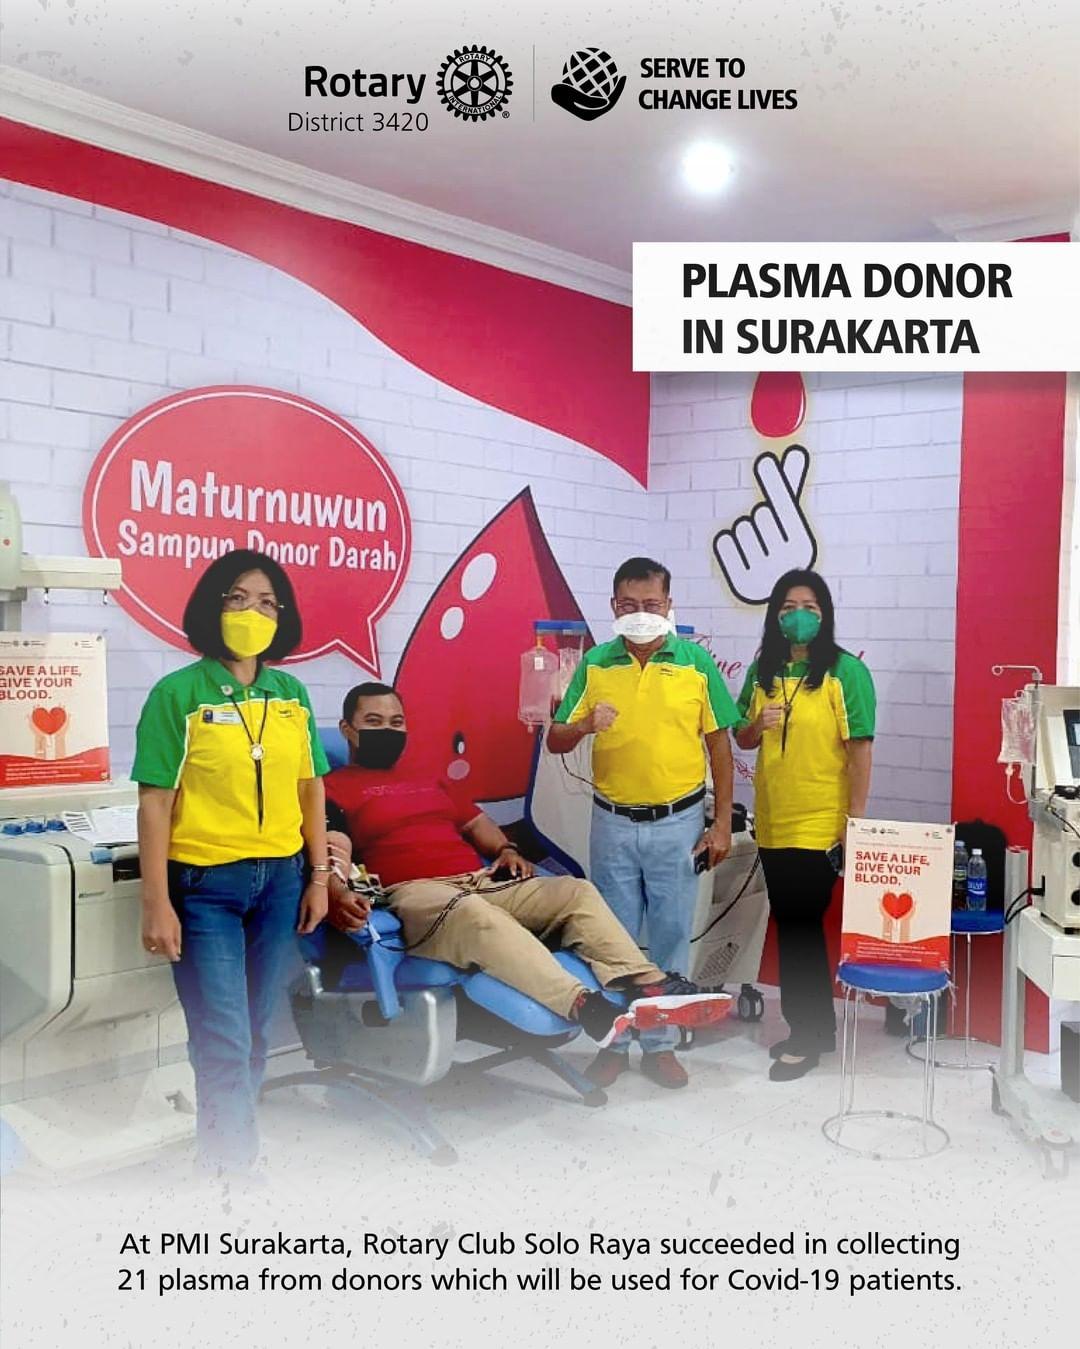 Plasma Donor in Surakarta